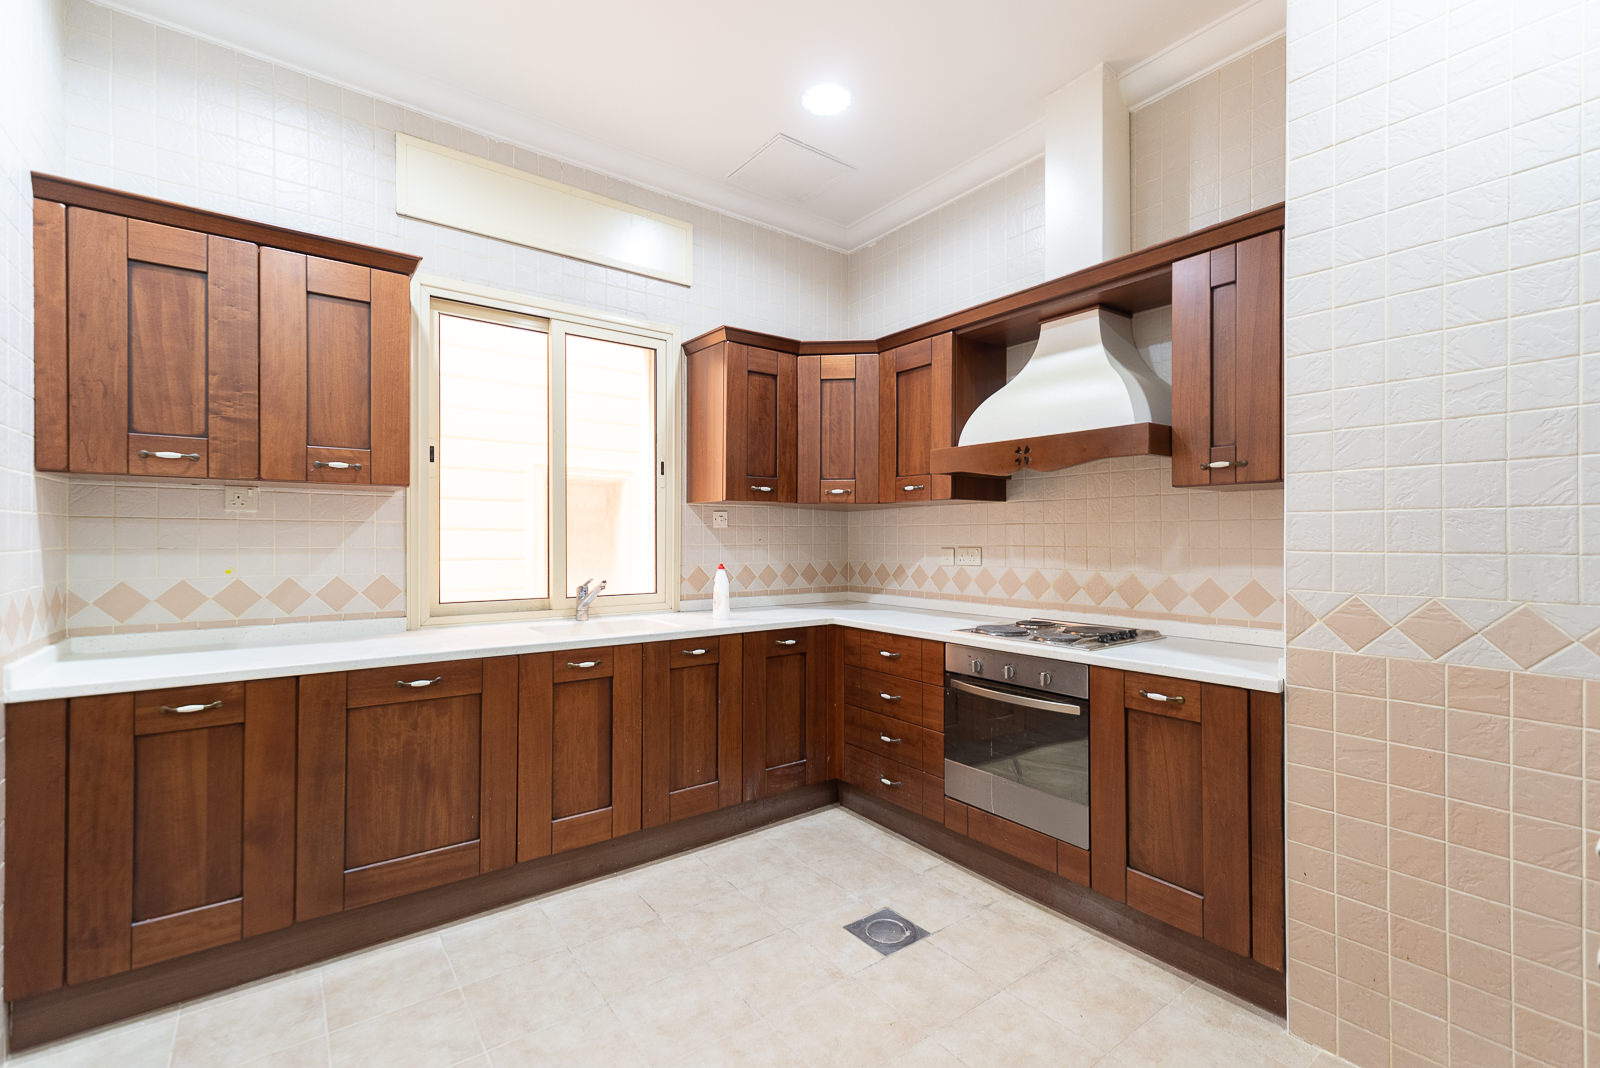 Mangaf – spacious, unfurnished, three bedroom floor w/balcony